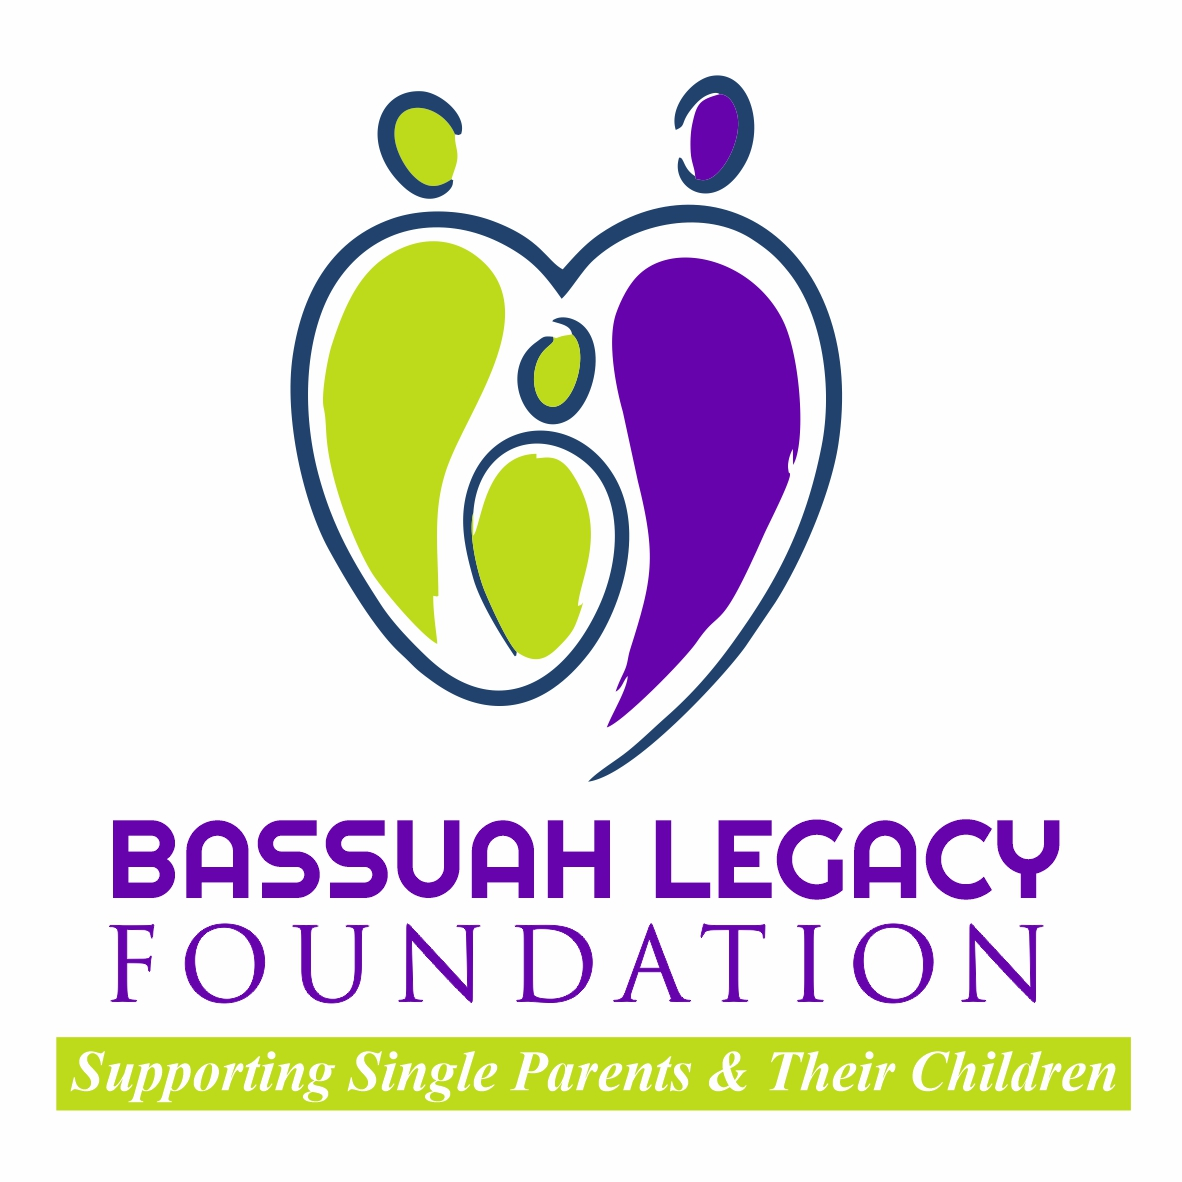 BASSUAH LEGACY FOUNDATION